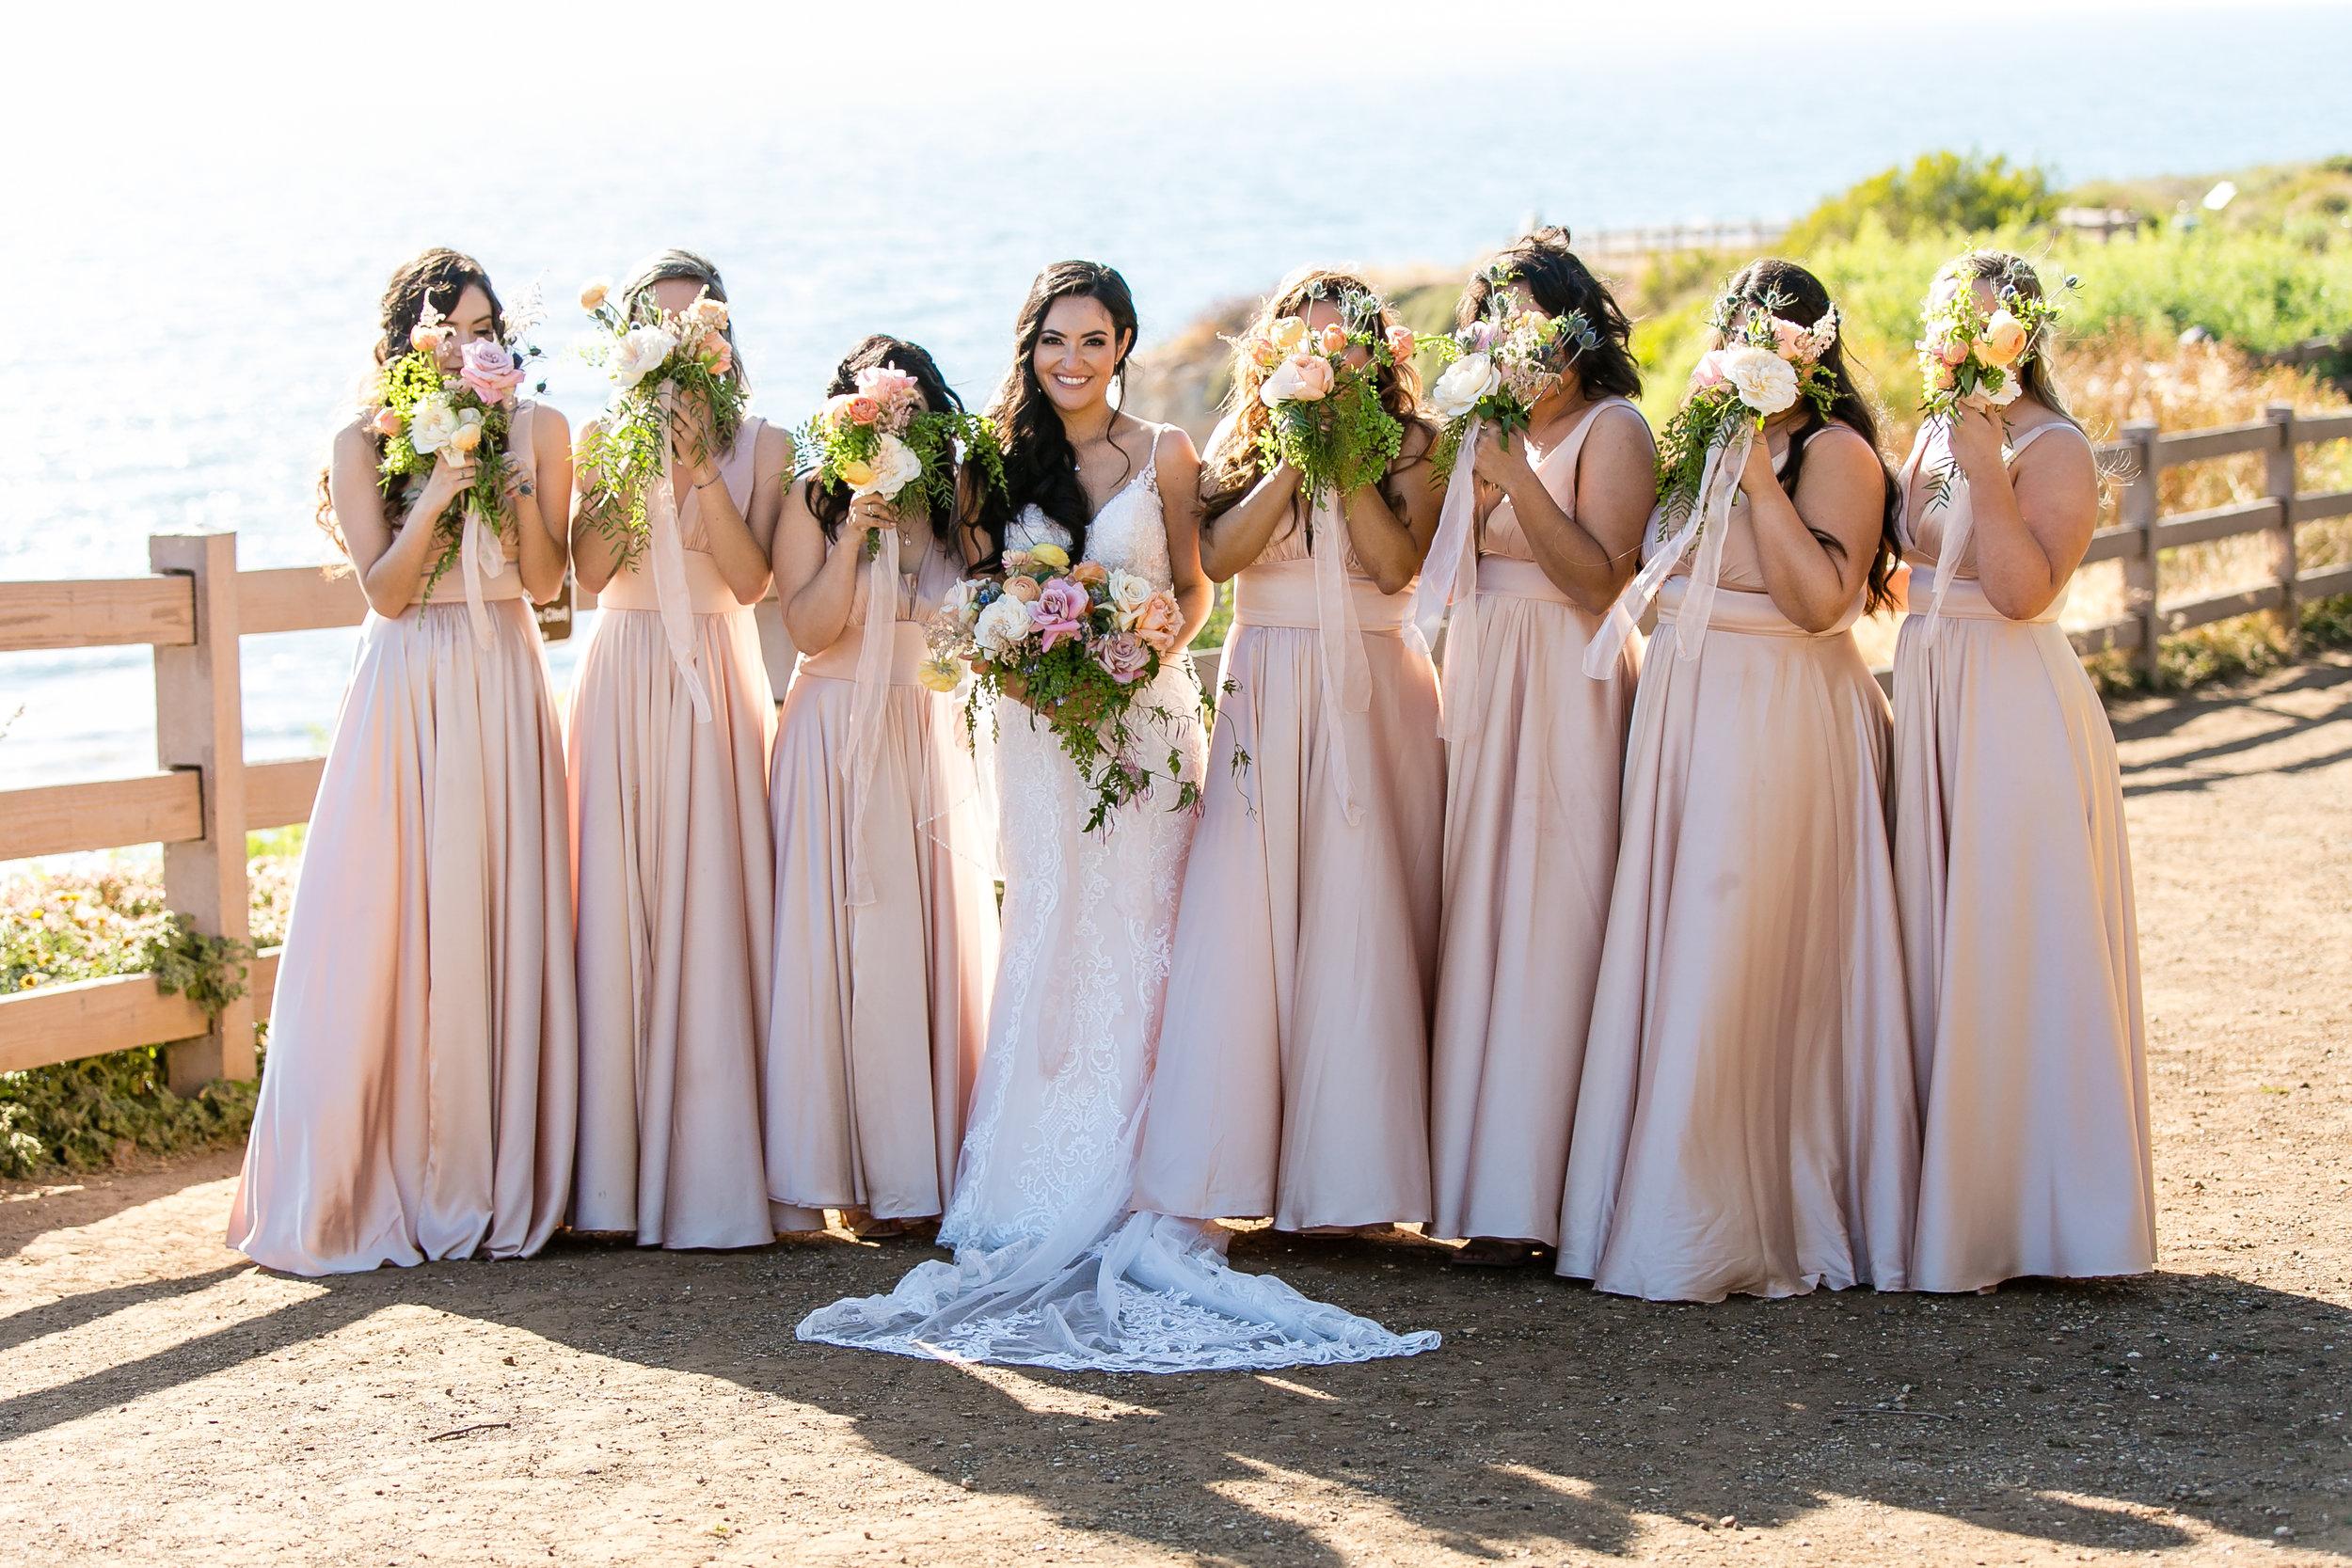 2019_05_24_Wedding_Barajas_0733.jpg